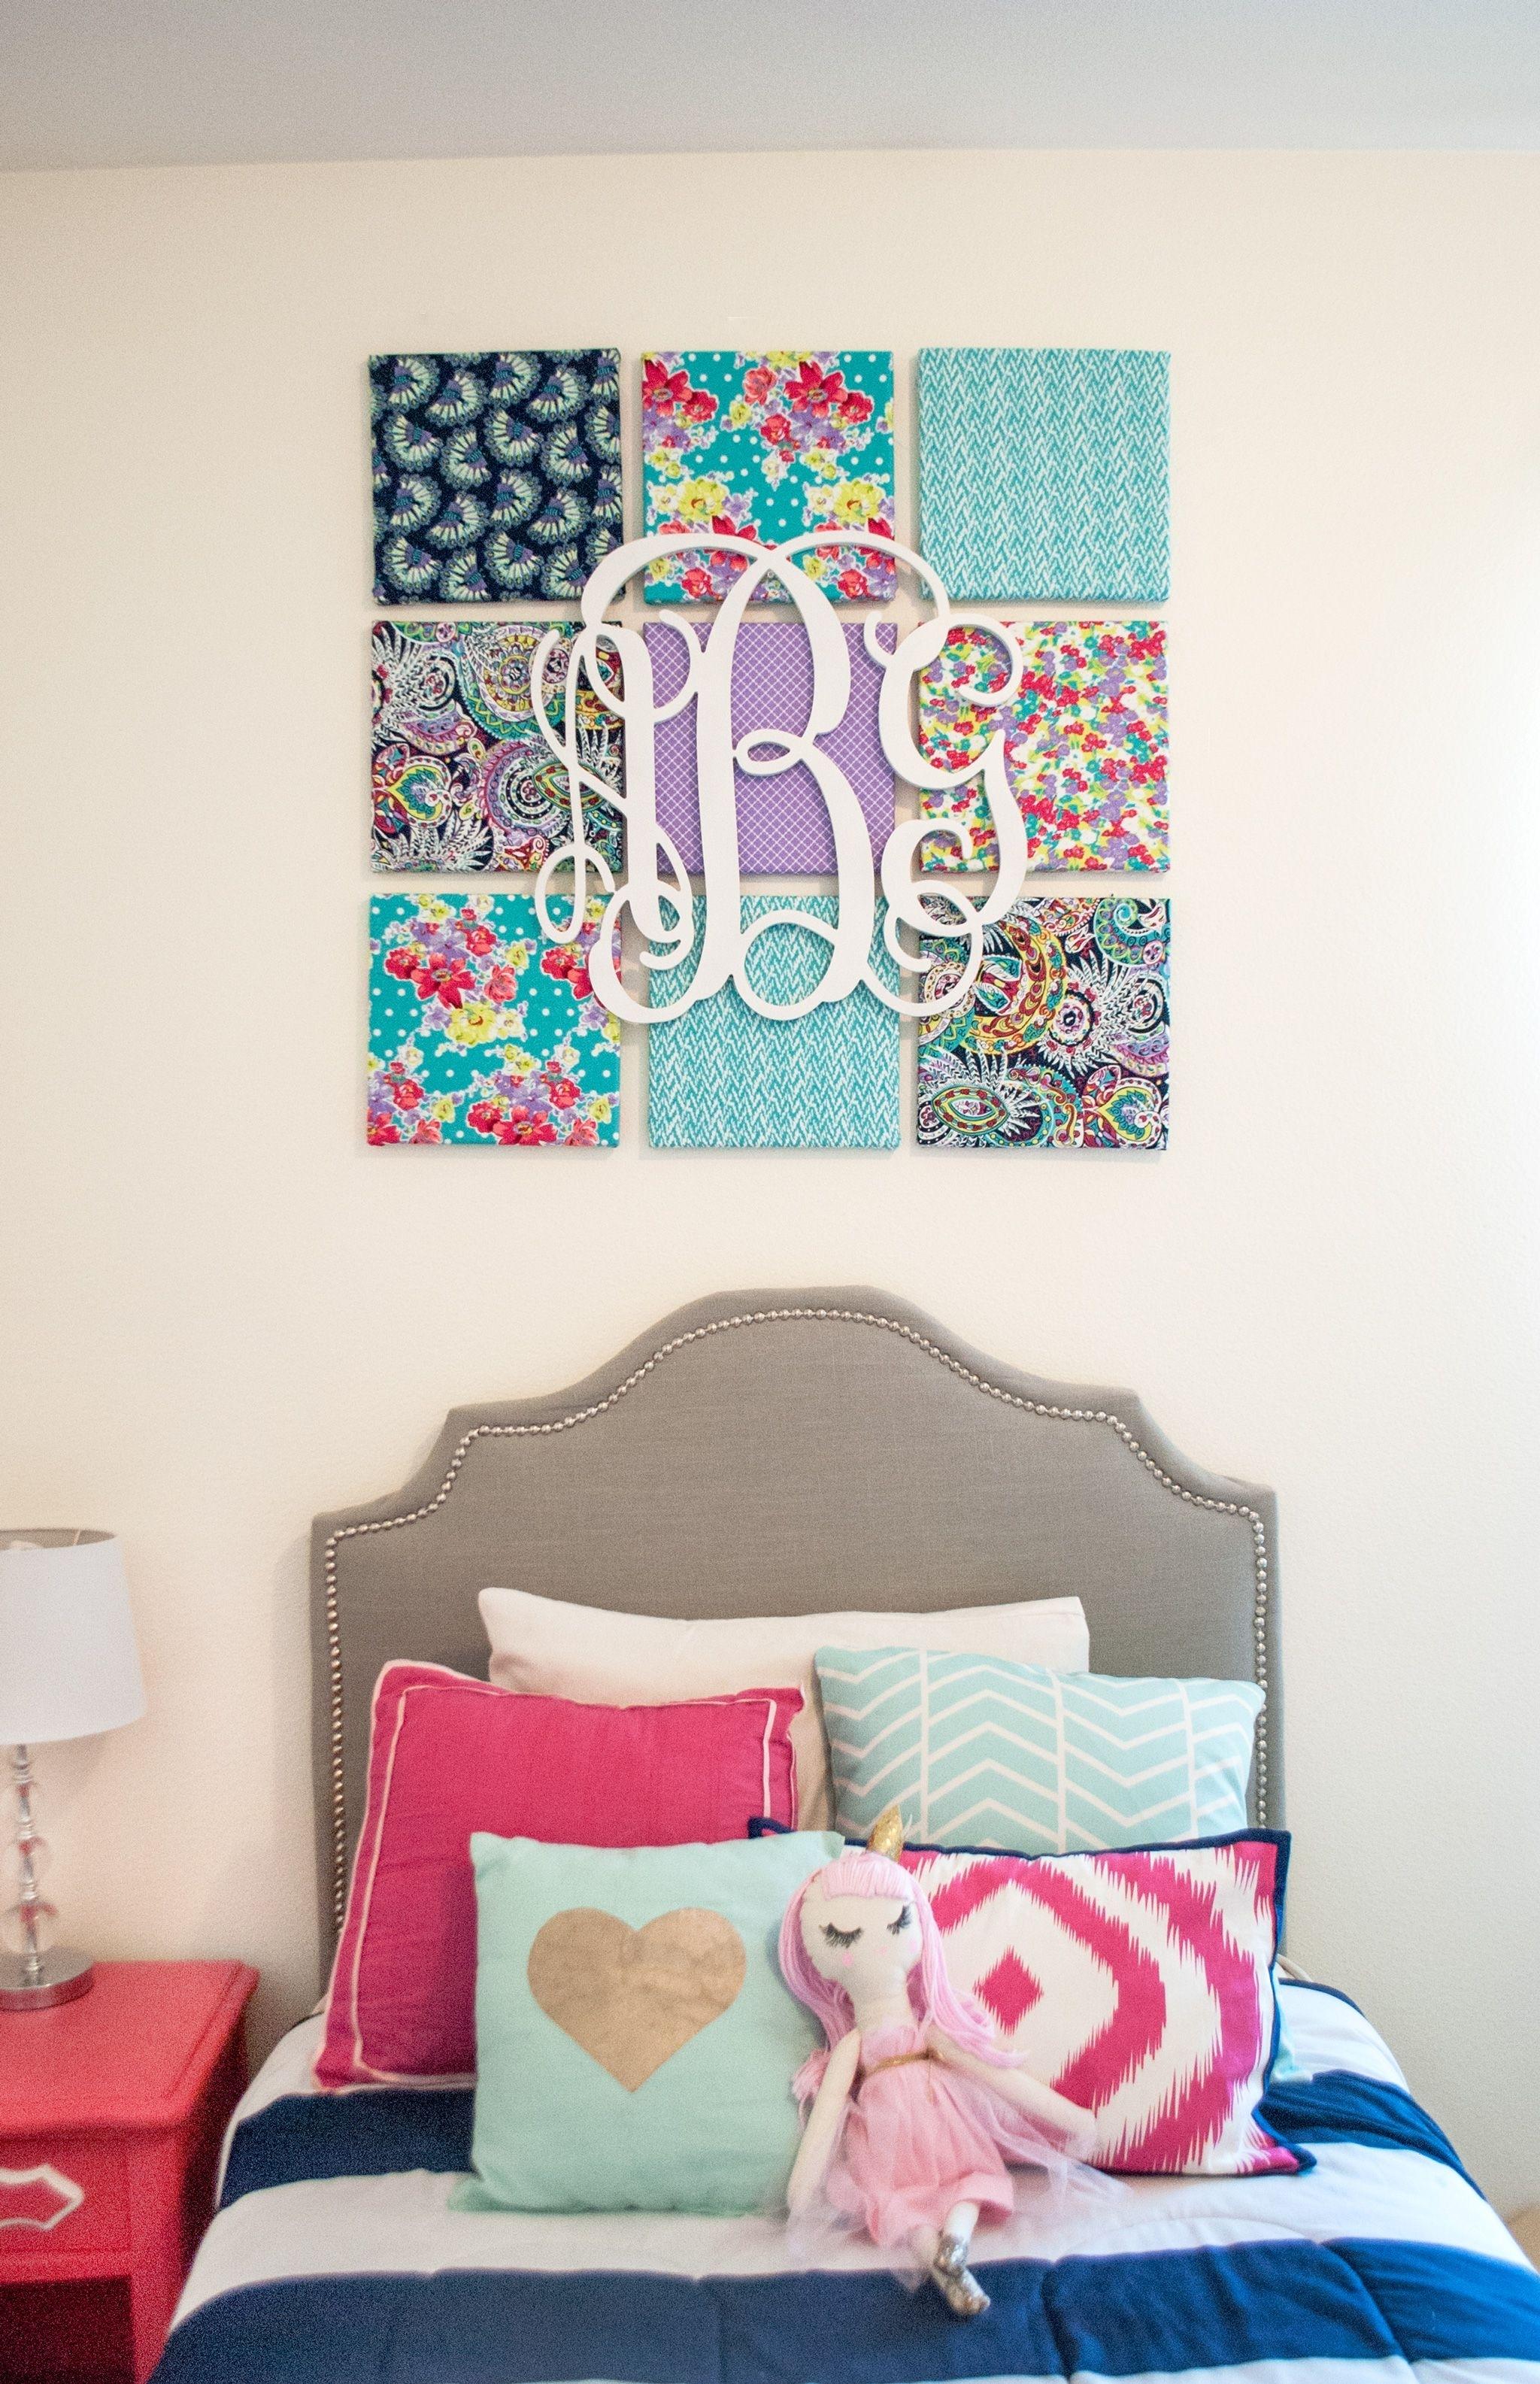 Diy Fabric Wall Art | Monogram Wall, Kids Rooms And Monograms pertaining to Newest Fabric Wall Art Canvas